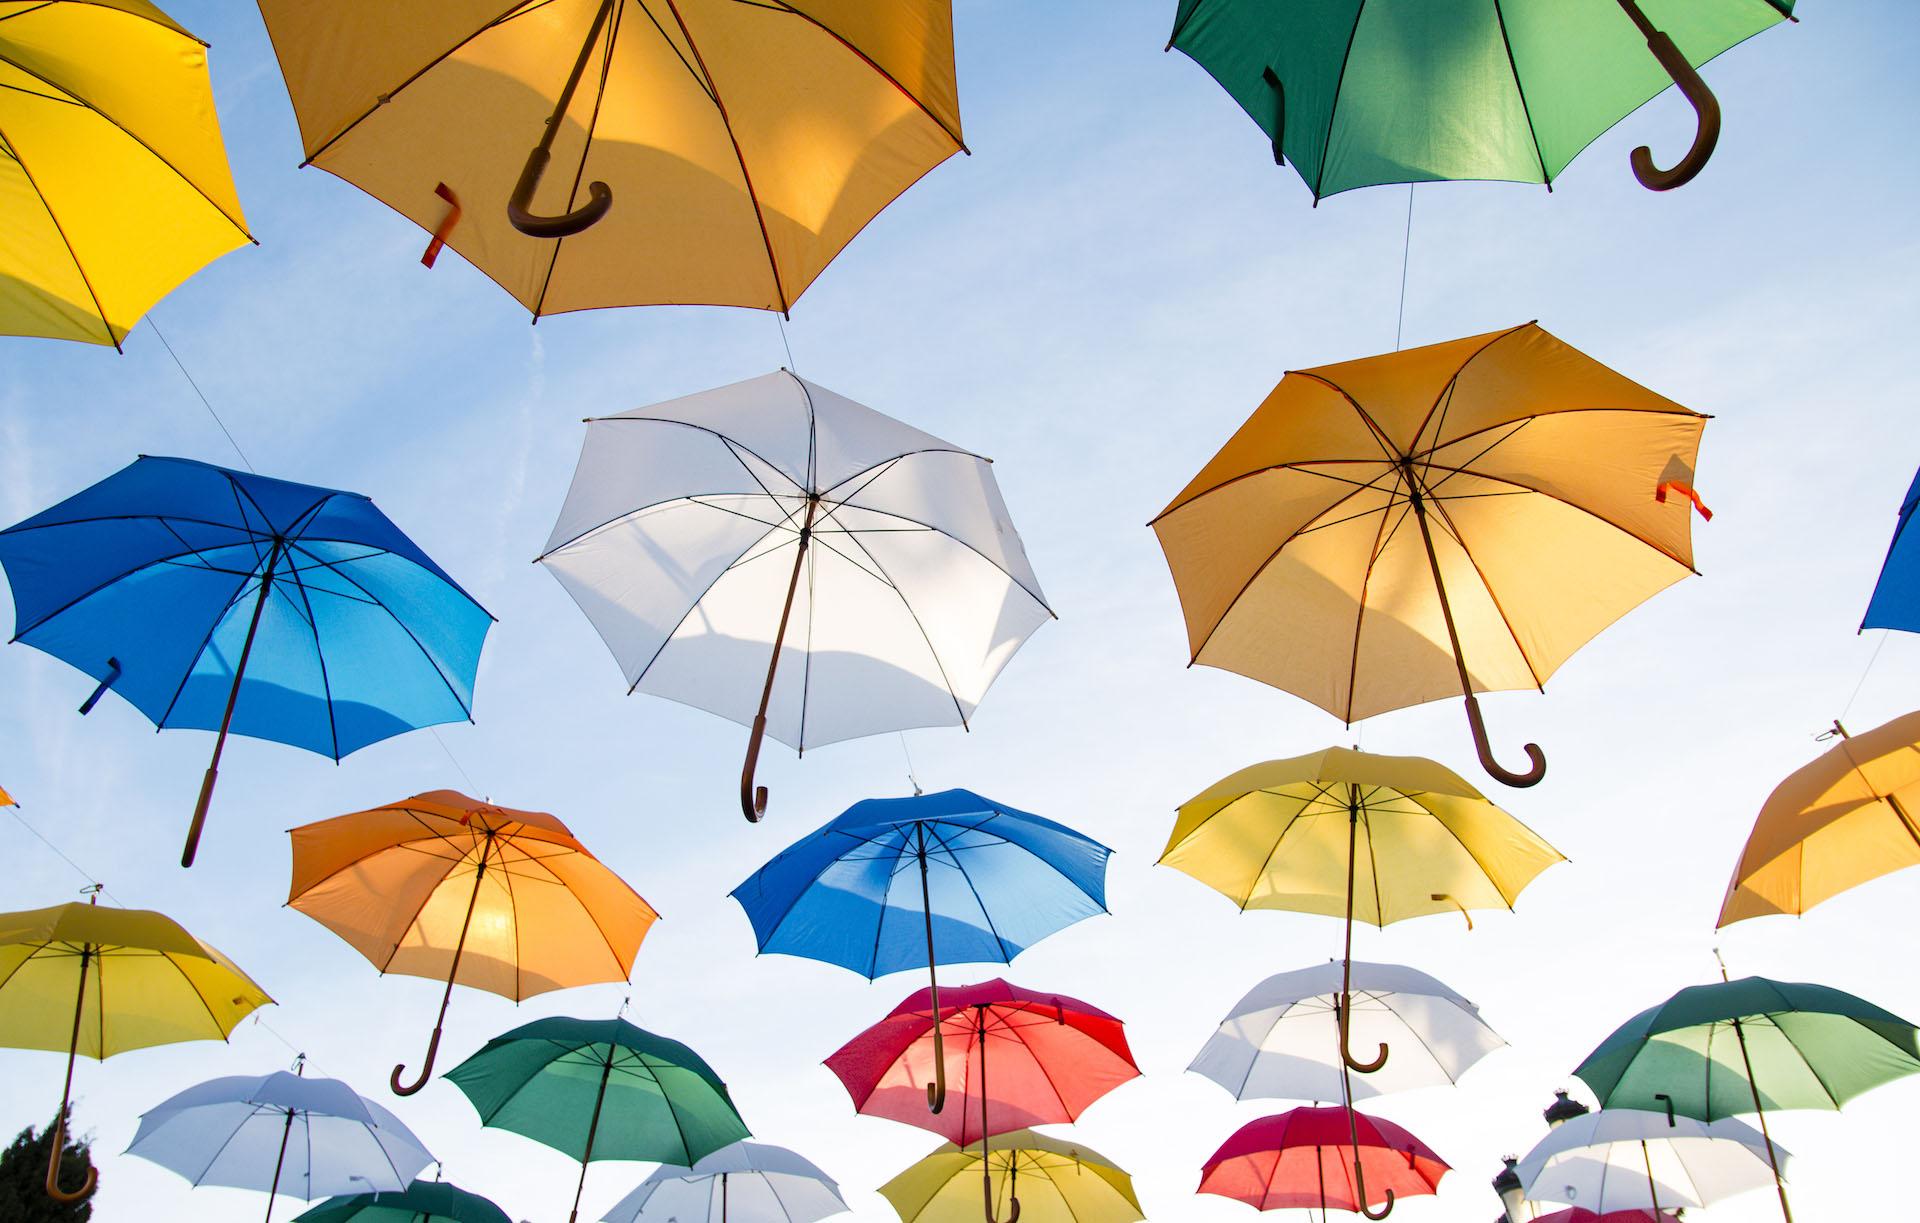 paraguas, colores, cielo, volar, arte - Fondos de Pantalla HD - professor-falken.com